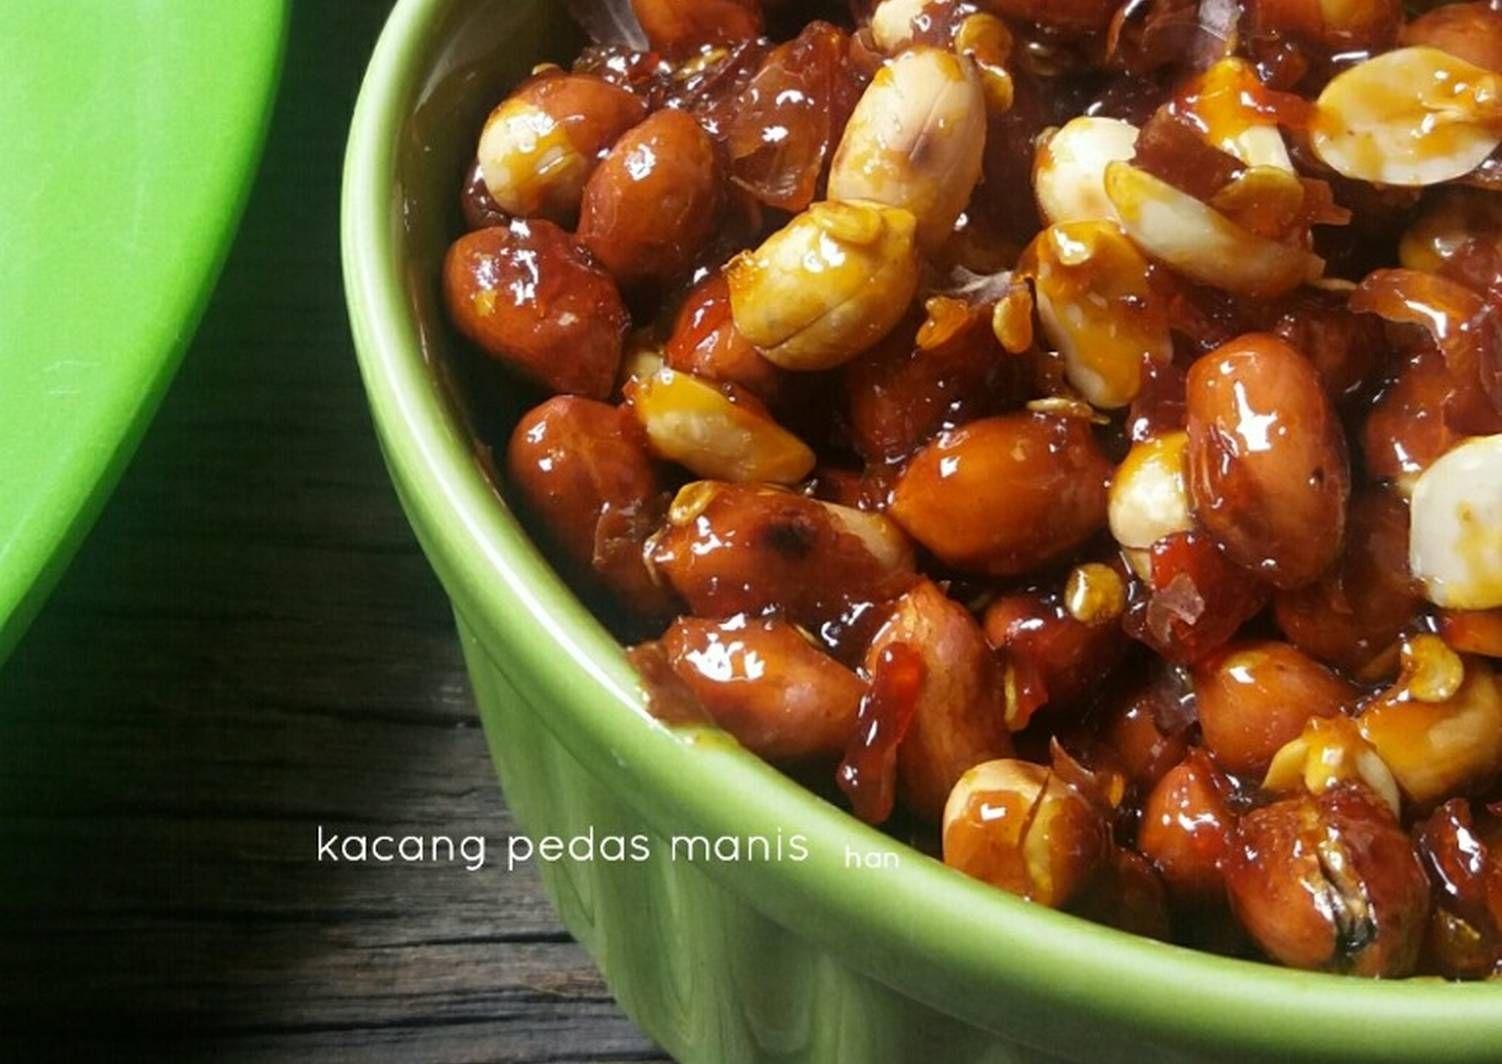 Resep Kacang Pedas Manis Oleh Izza Han Resep Memasak Kacang Resep